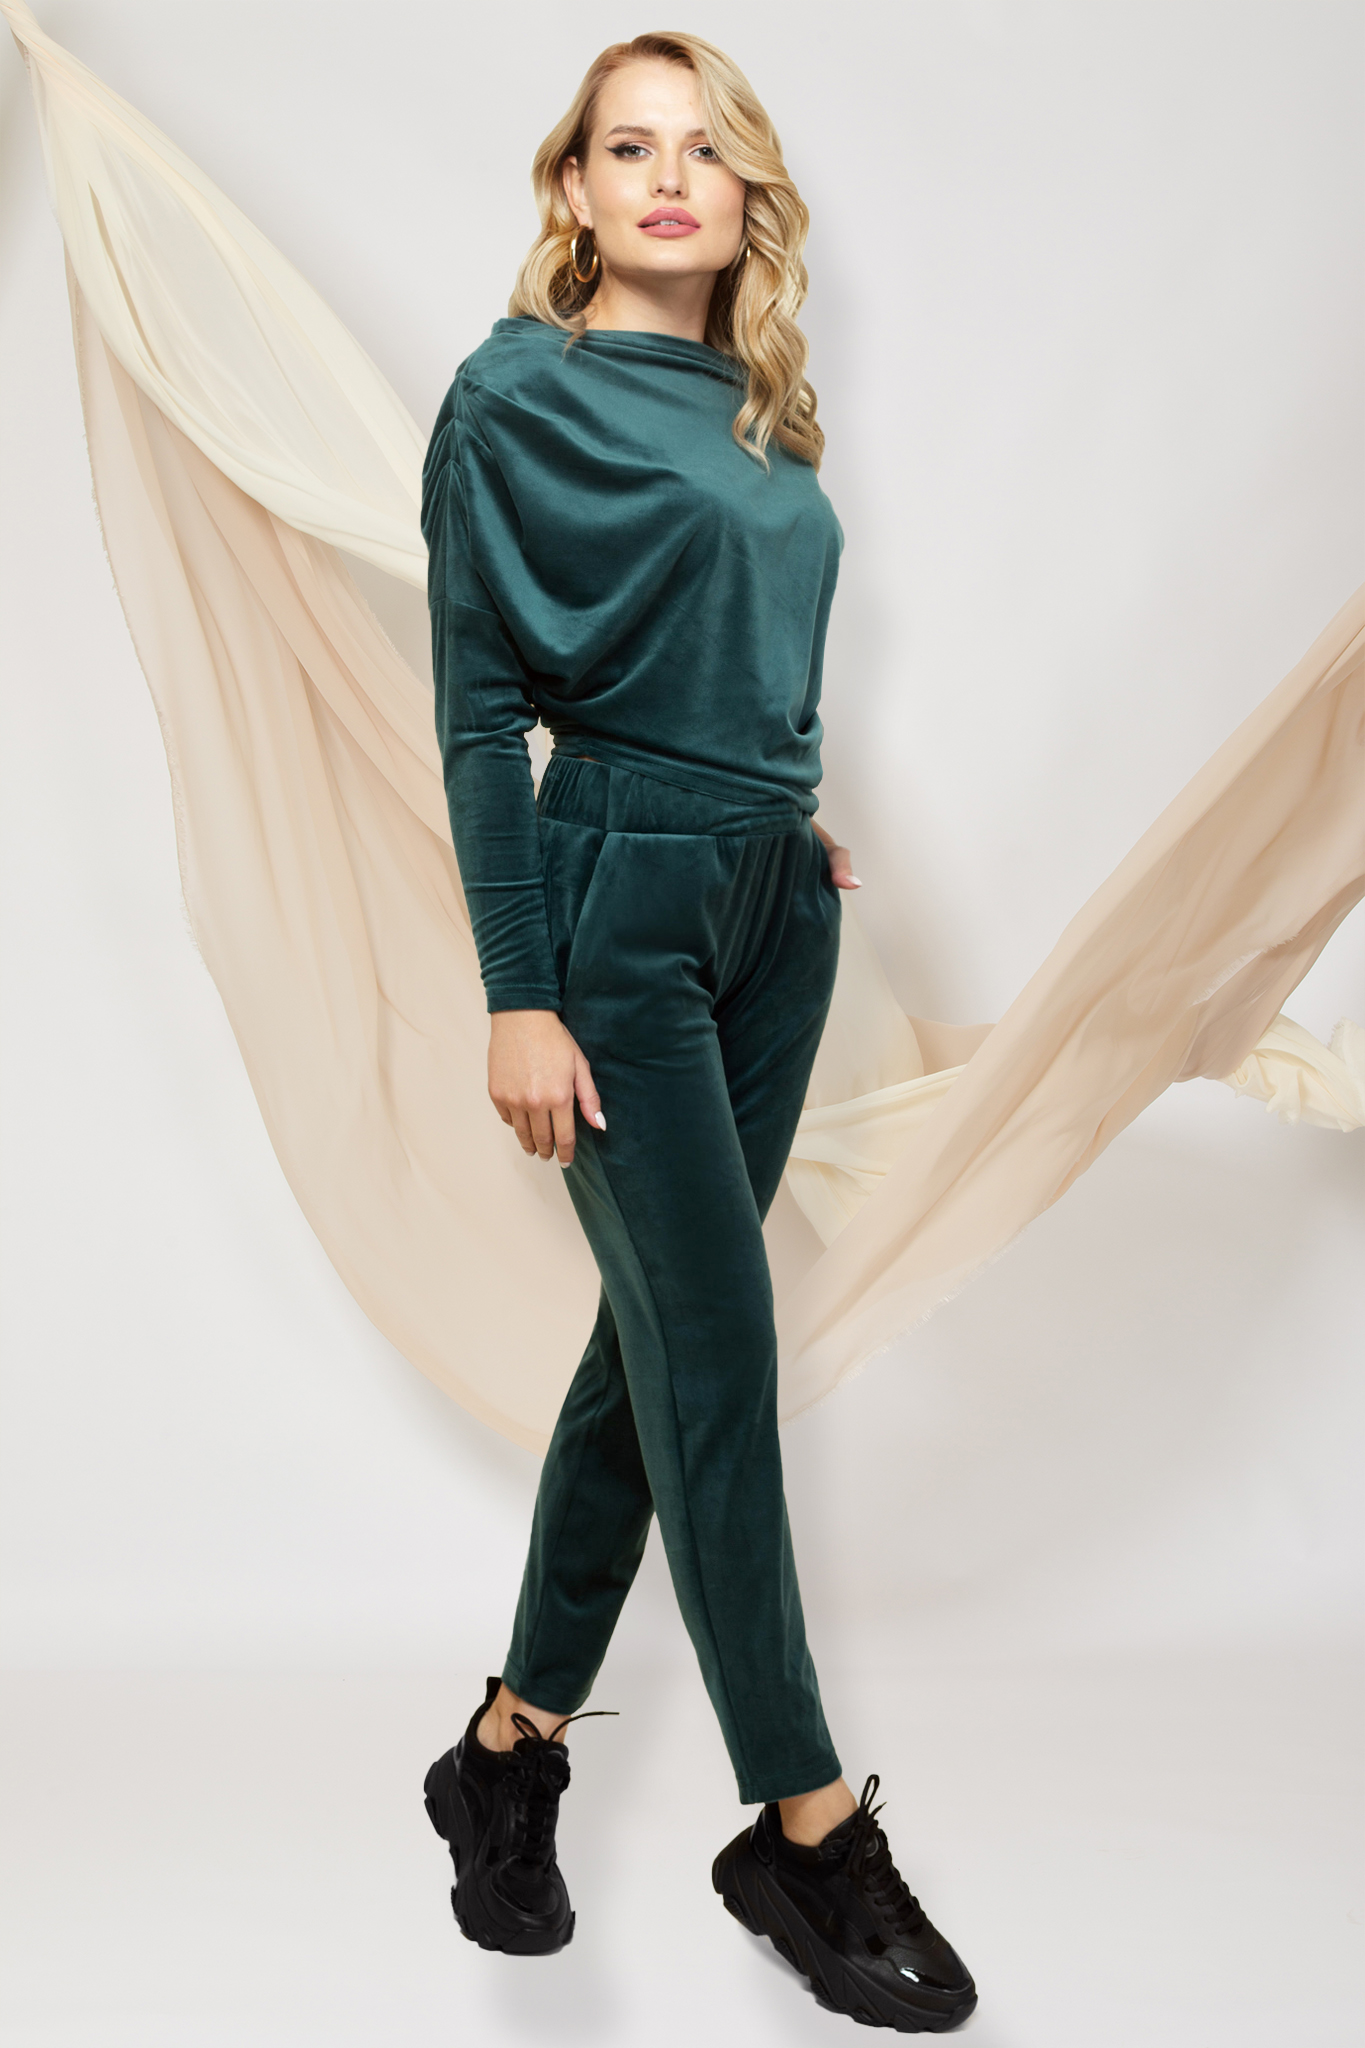 Trening PrettyGirl verde-inchis cu croi larg din doua piese din catifea cu pantaloni cu buzunare si bluza cu umar cazut